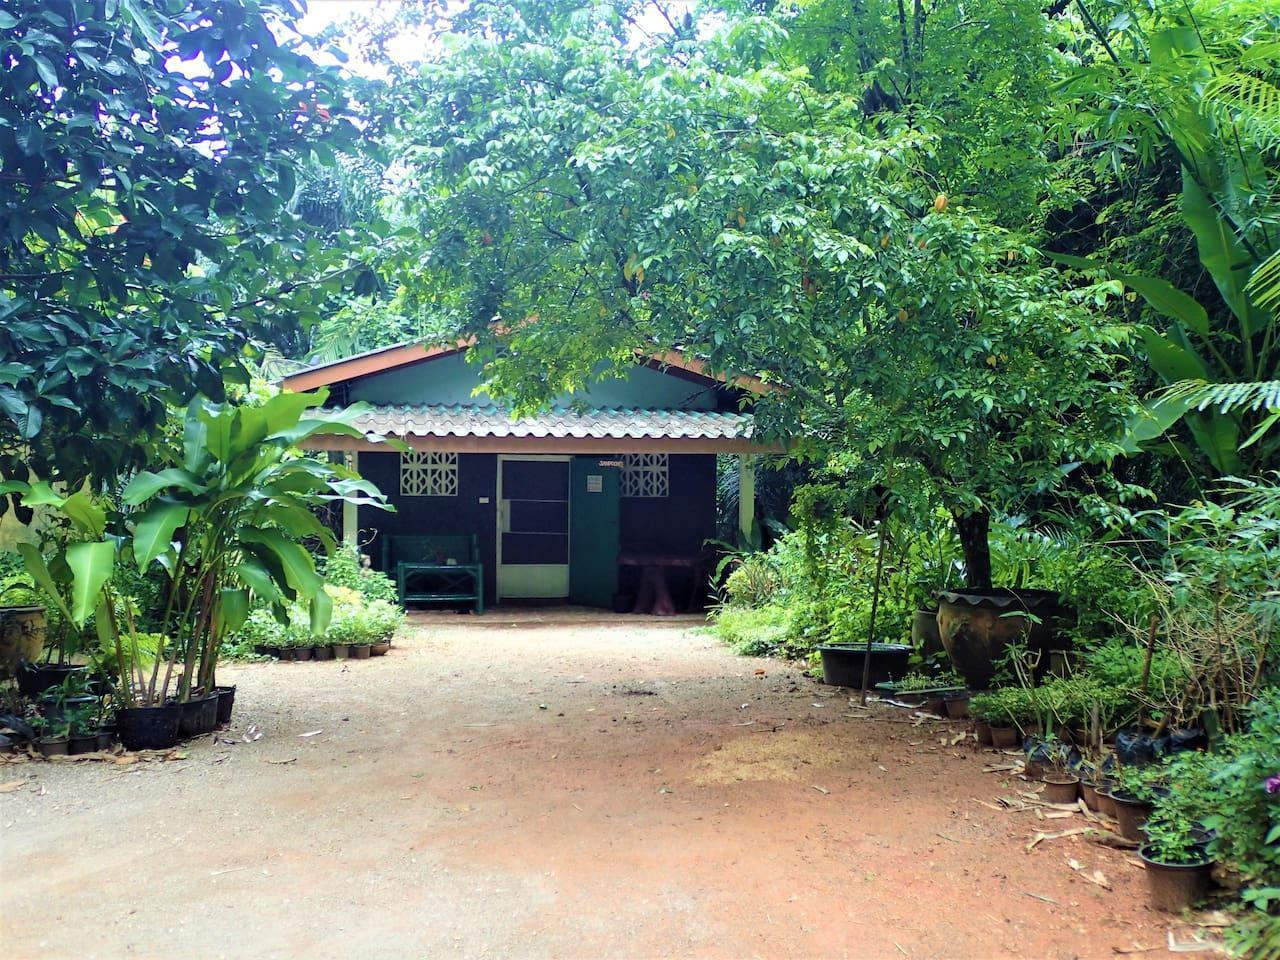 Authentic Thai Culture in Magical Garden Landscape บังกะโล 1 ห้องนอน 2 ห้องน้ำส่วนตัว ขนาด 50 ตร.ม. – อ่าวลึก